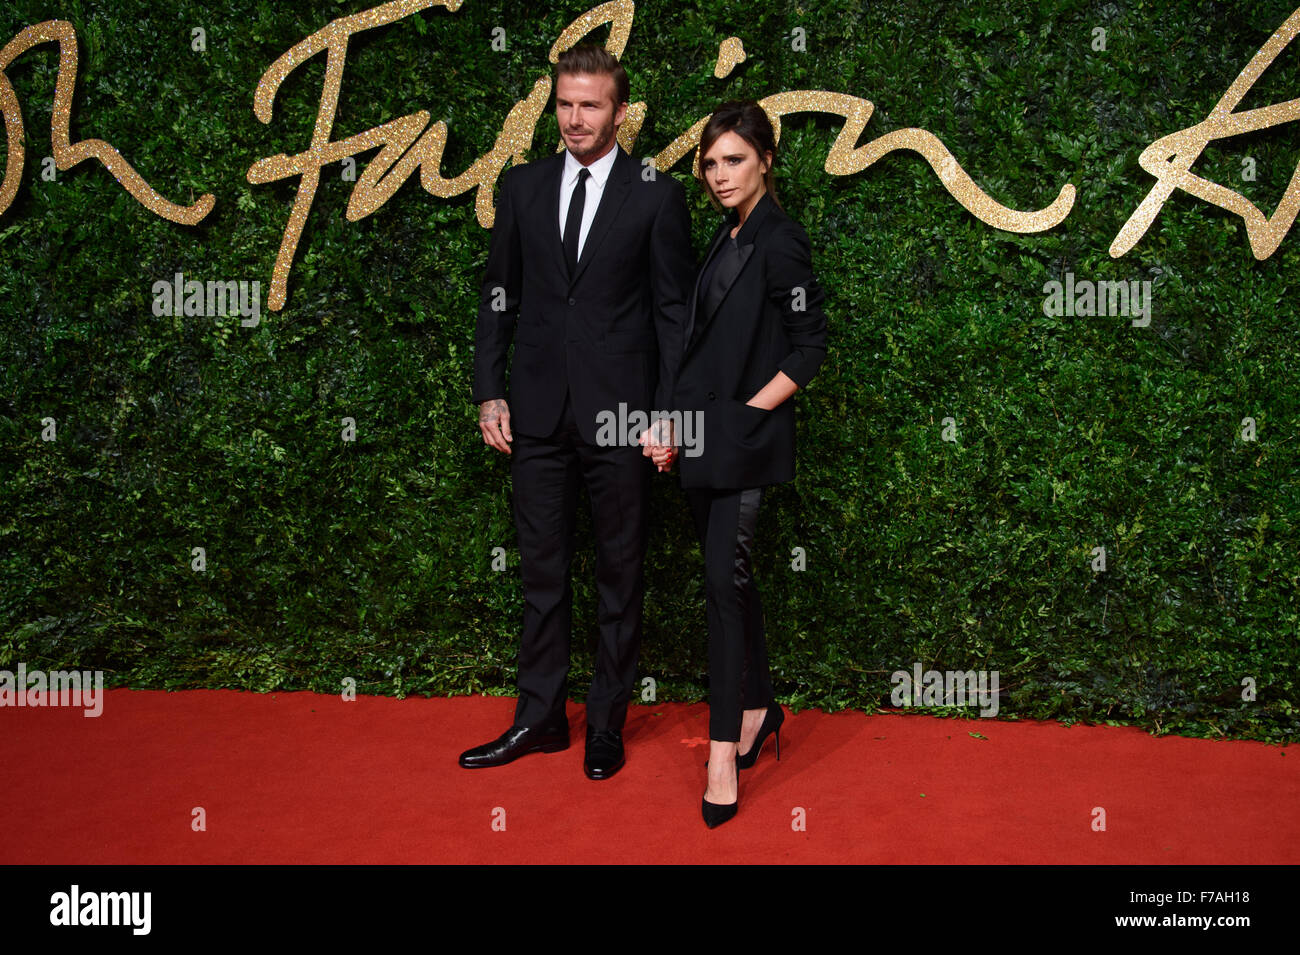 f30faf4c8e7 David Beckham and Victoria Beckham at the British Fashion Awards 2015 in  London - Stock Image